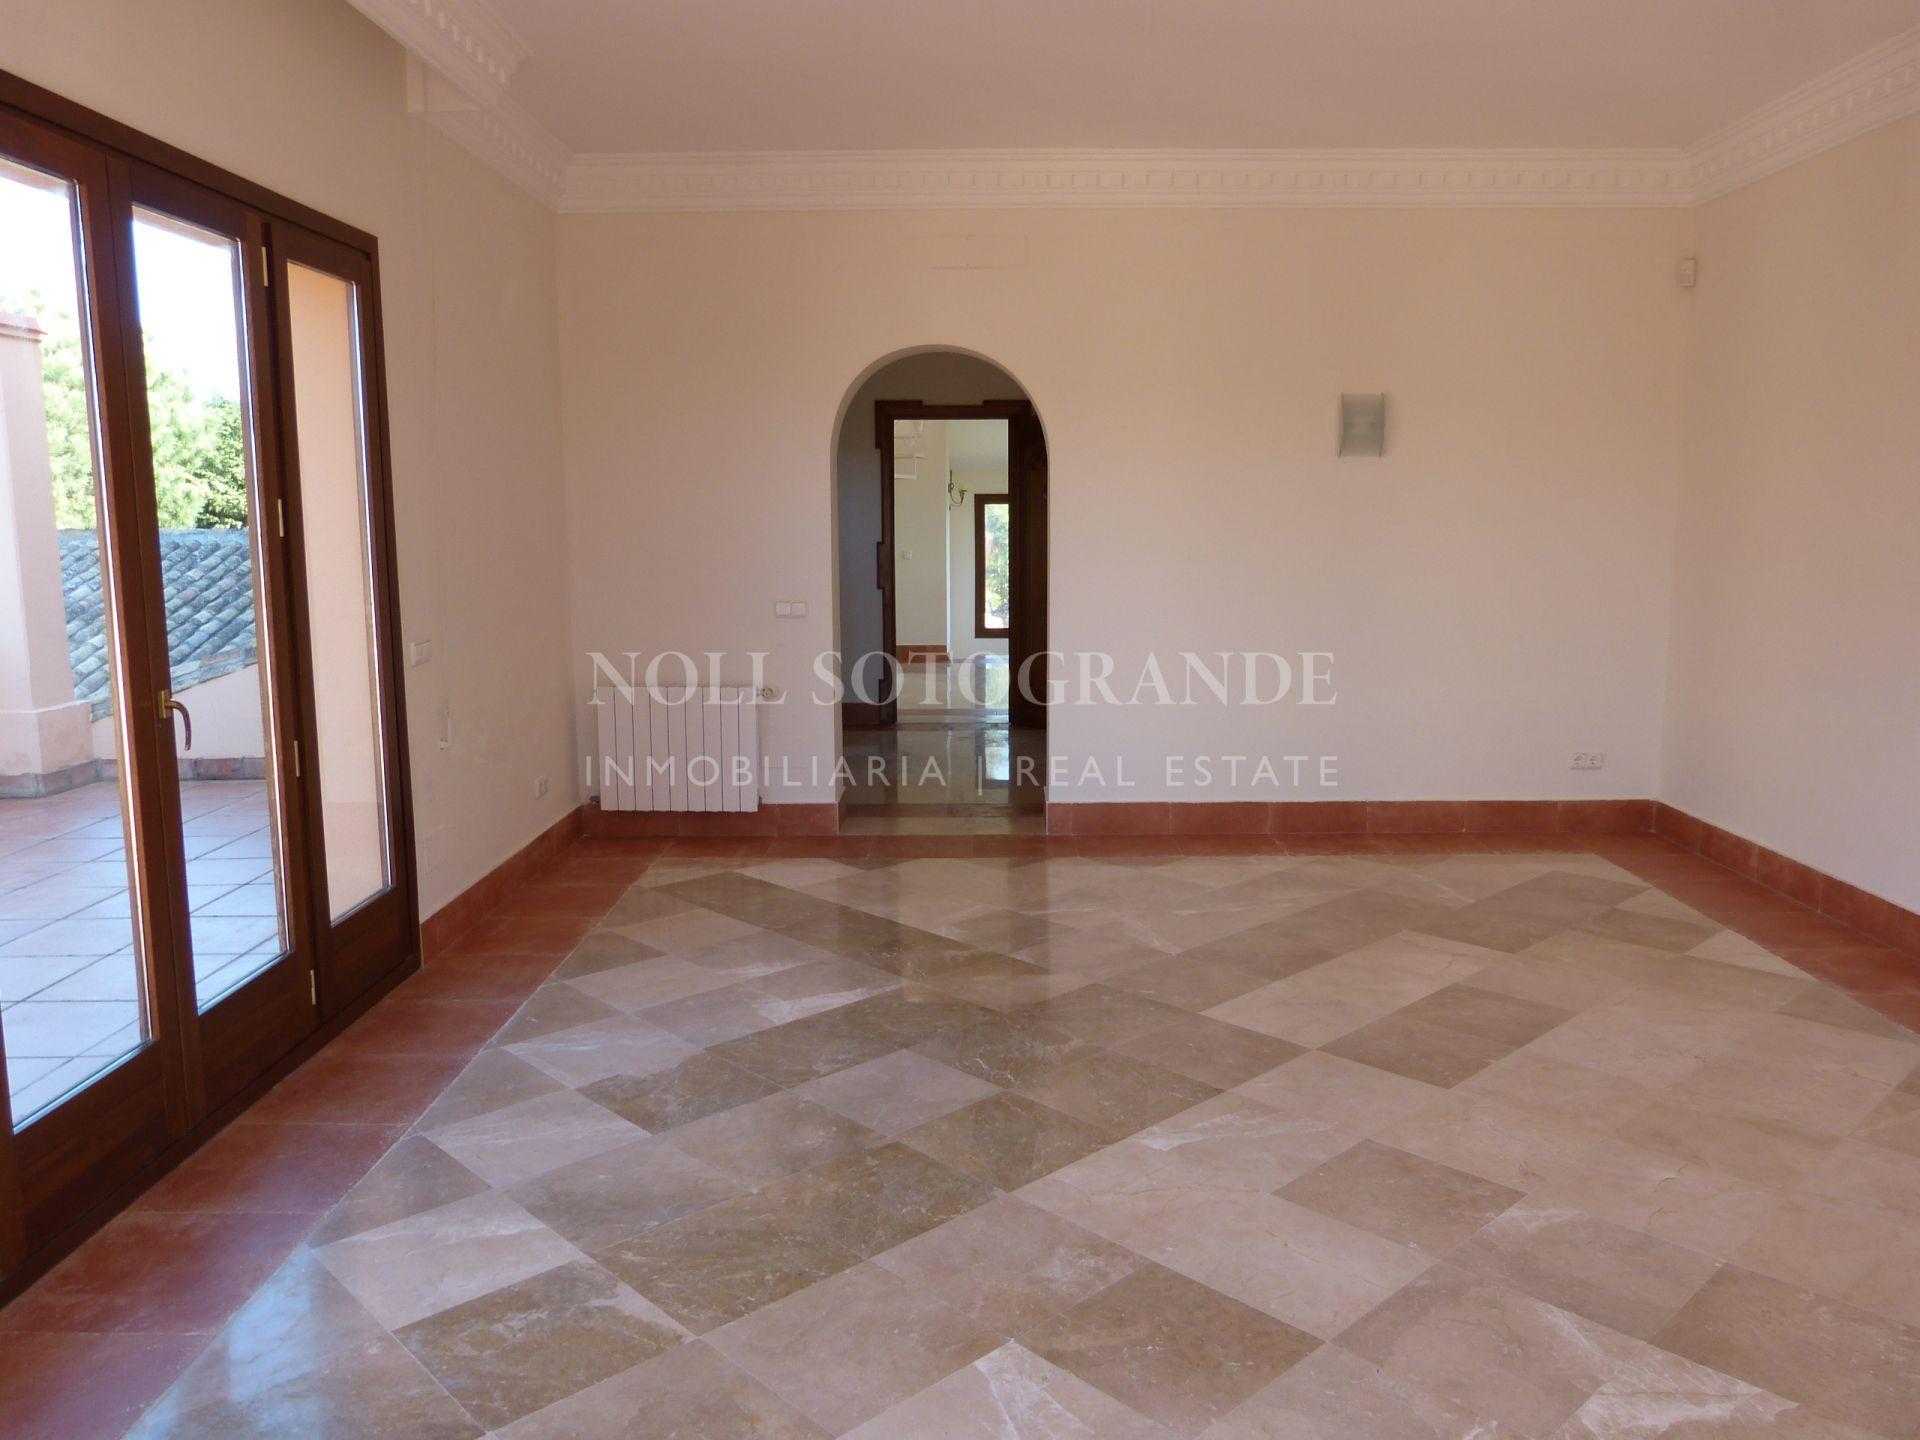 Villa close to the Sotogrande International School for rent